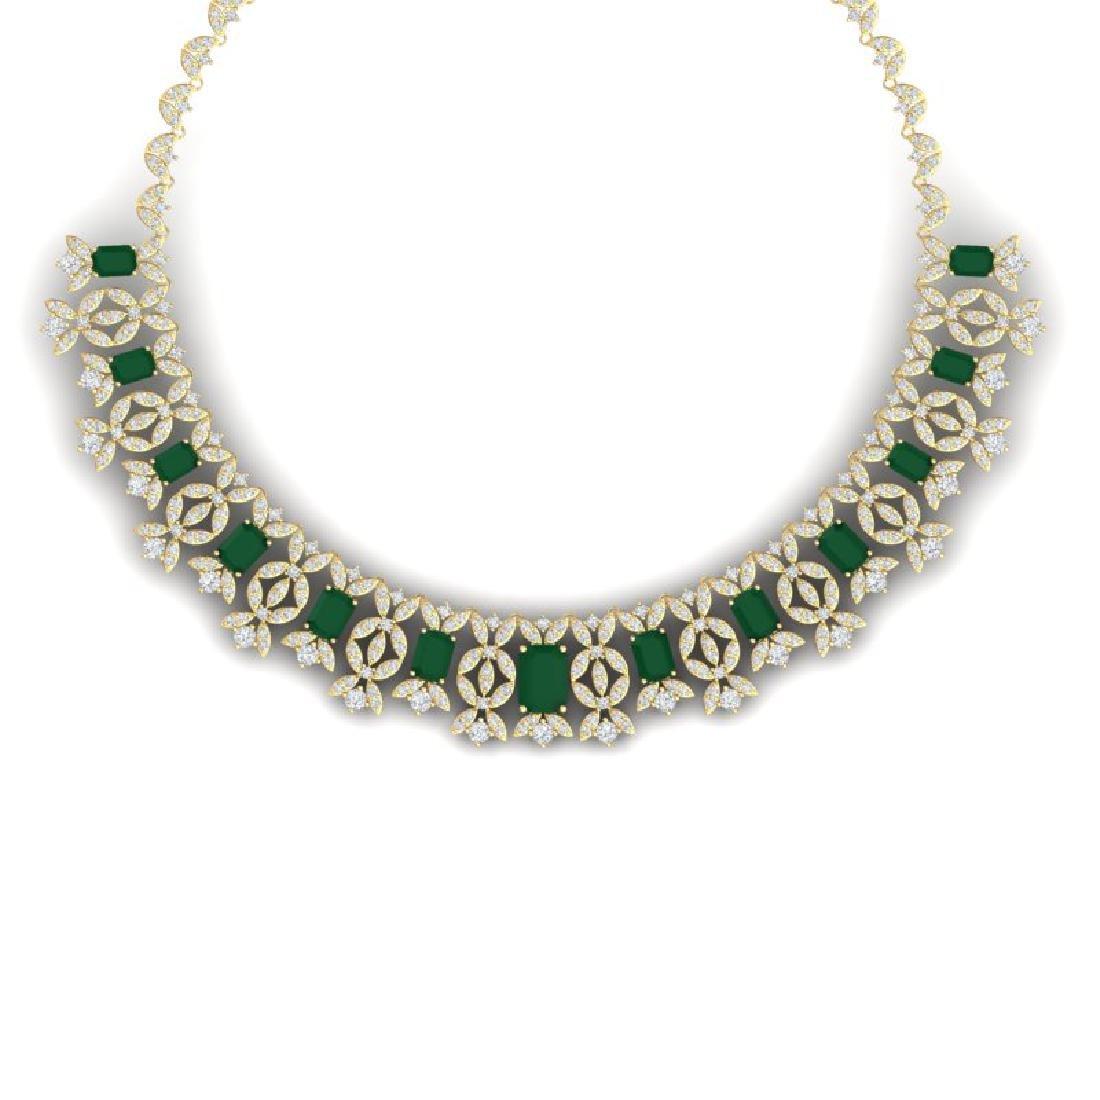 50.44 CTW Royalty Emerald & VS Diamond Necklace 18K